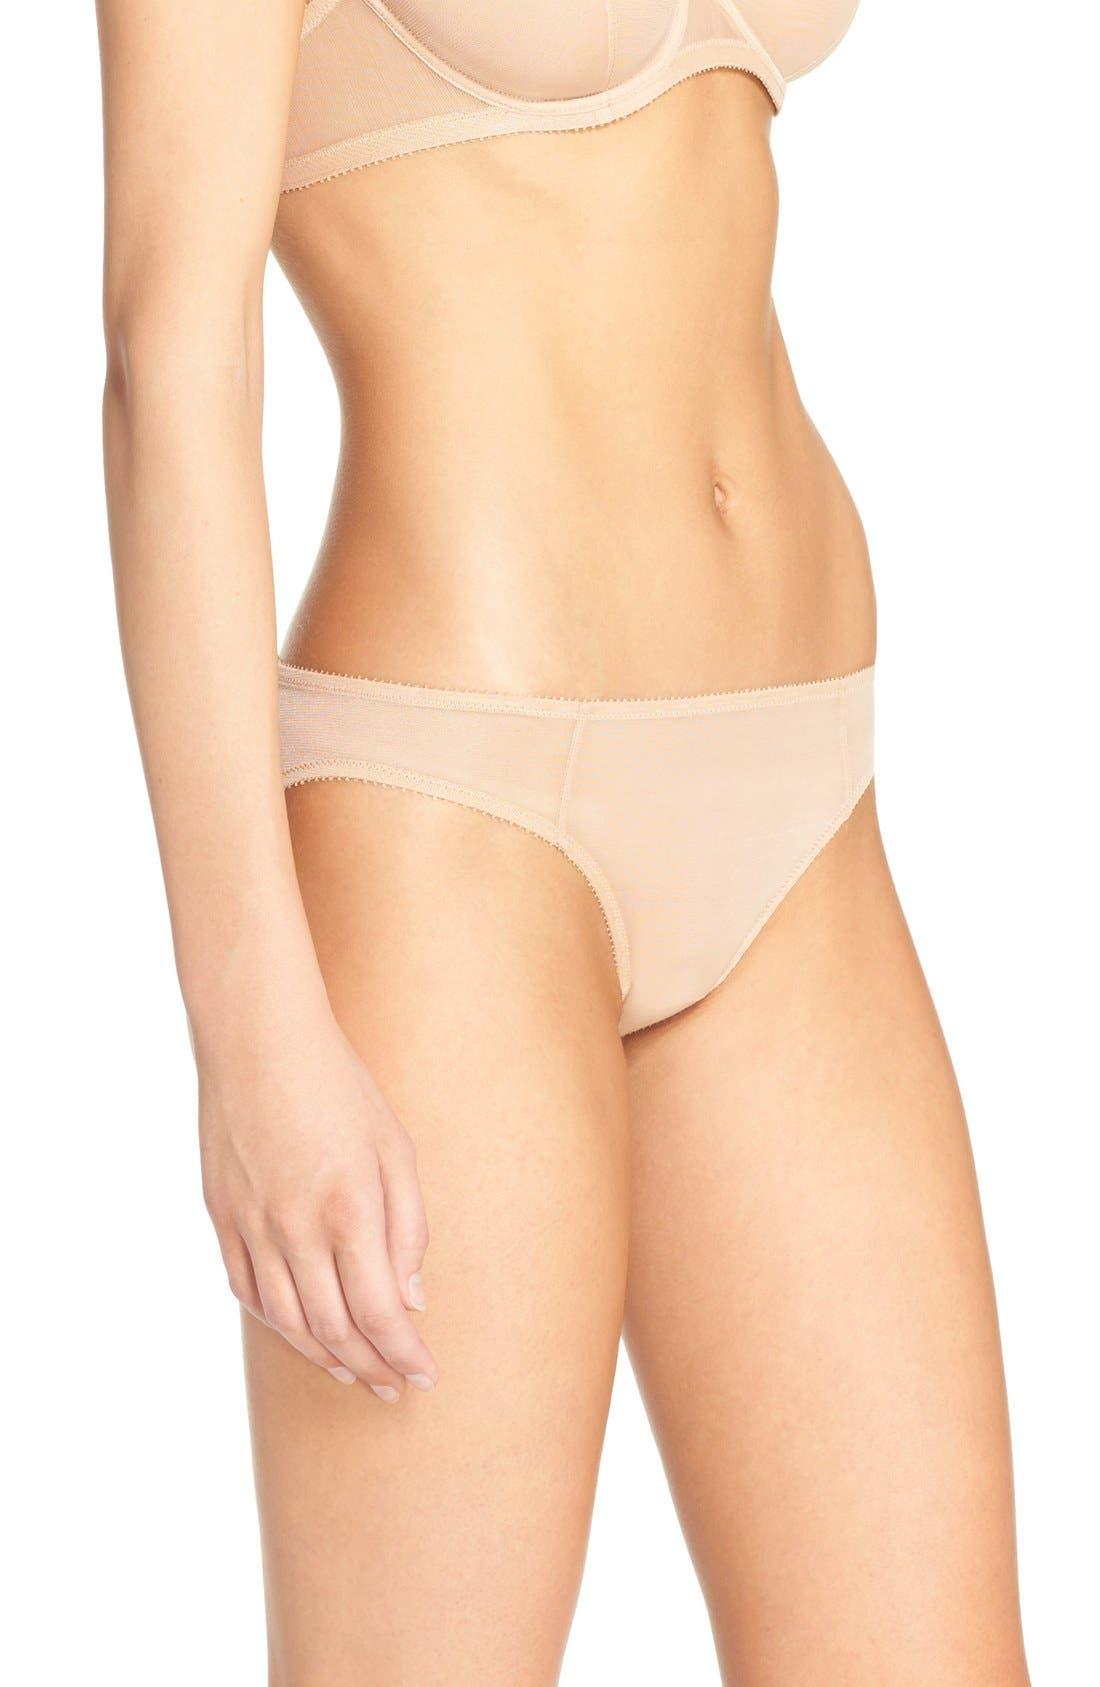 Alternate Image 3  - Epure by Lise Charmel Revelation Beaute Bikini